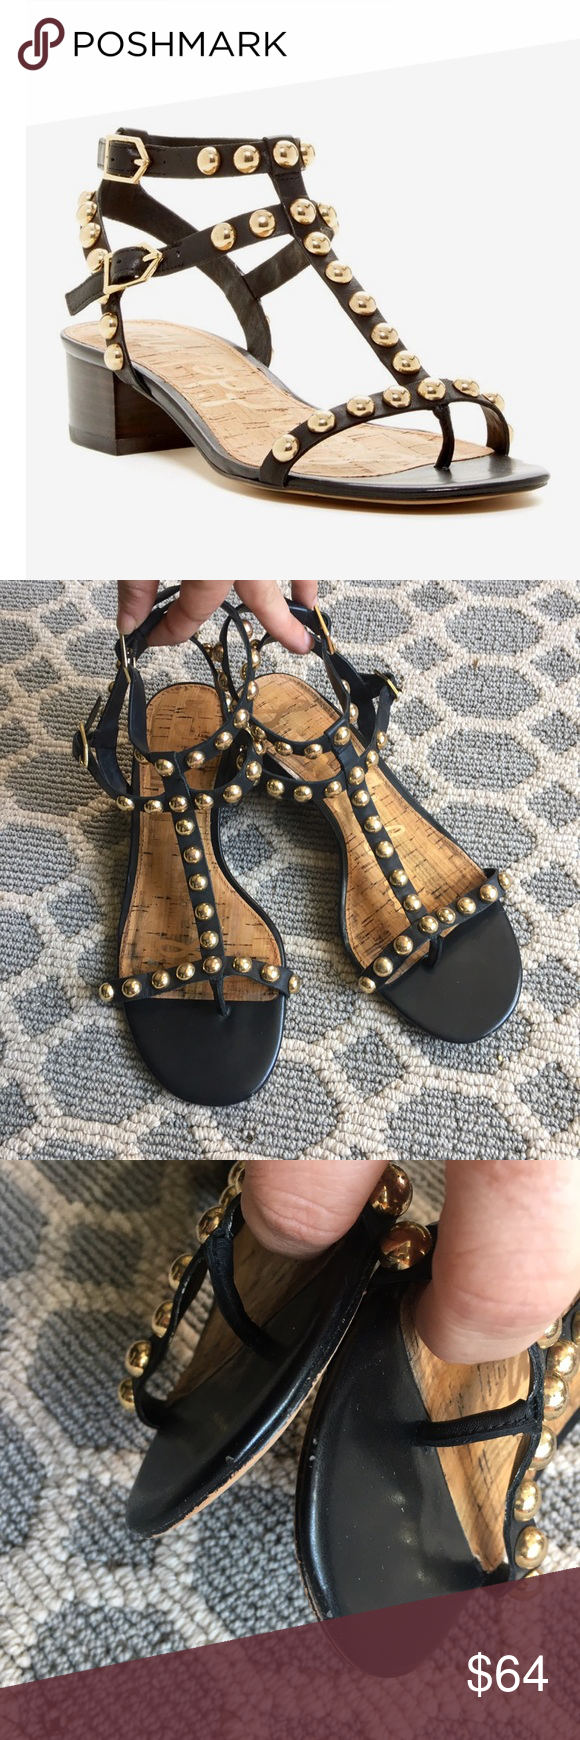 5836b7e6c Sam edelman asbury gladiator block heel sandals Very good condition